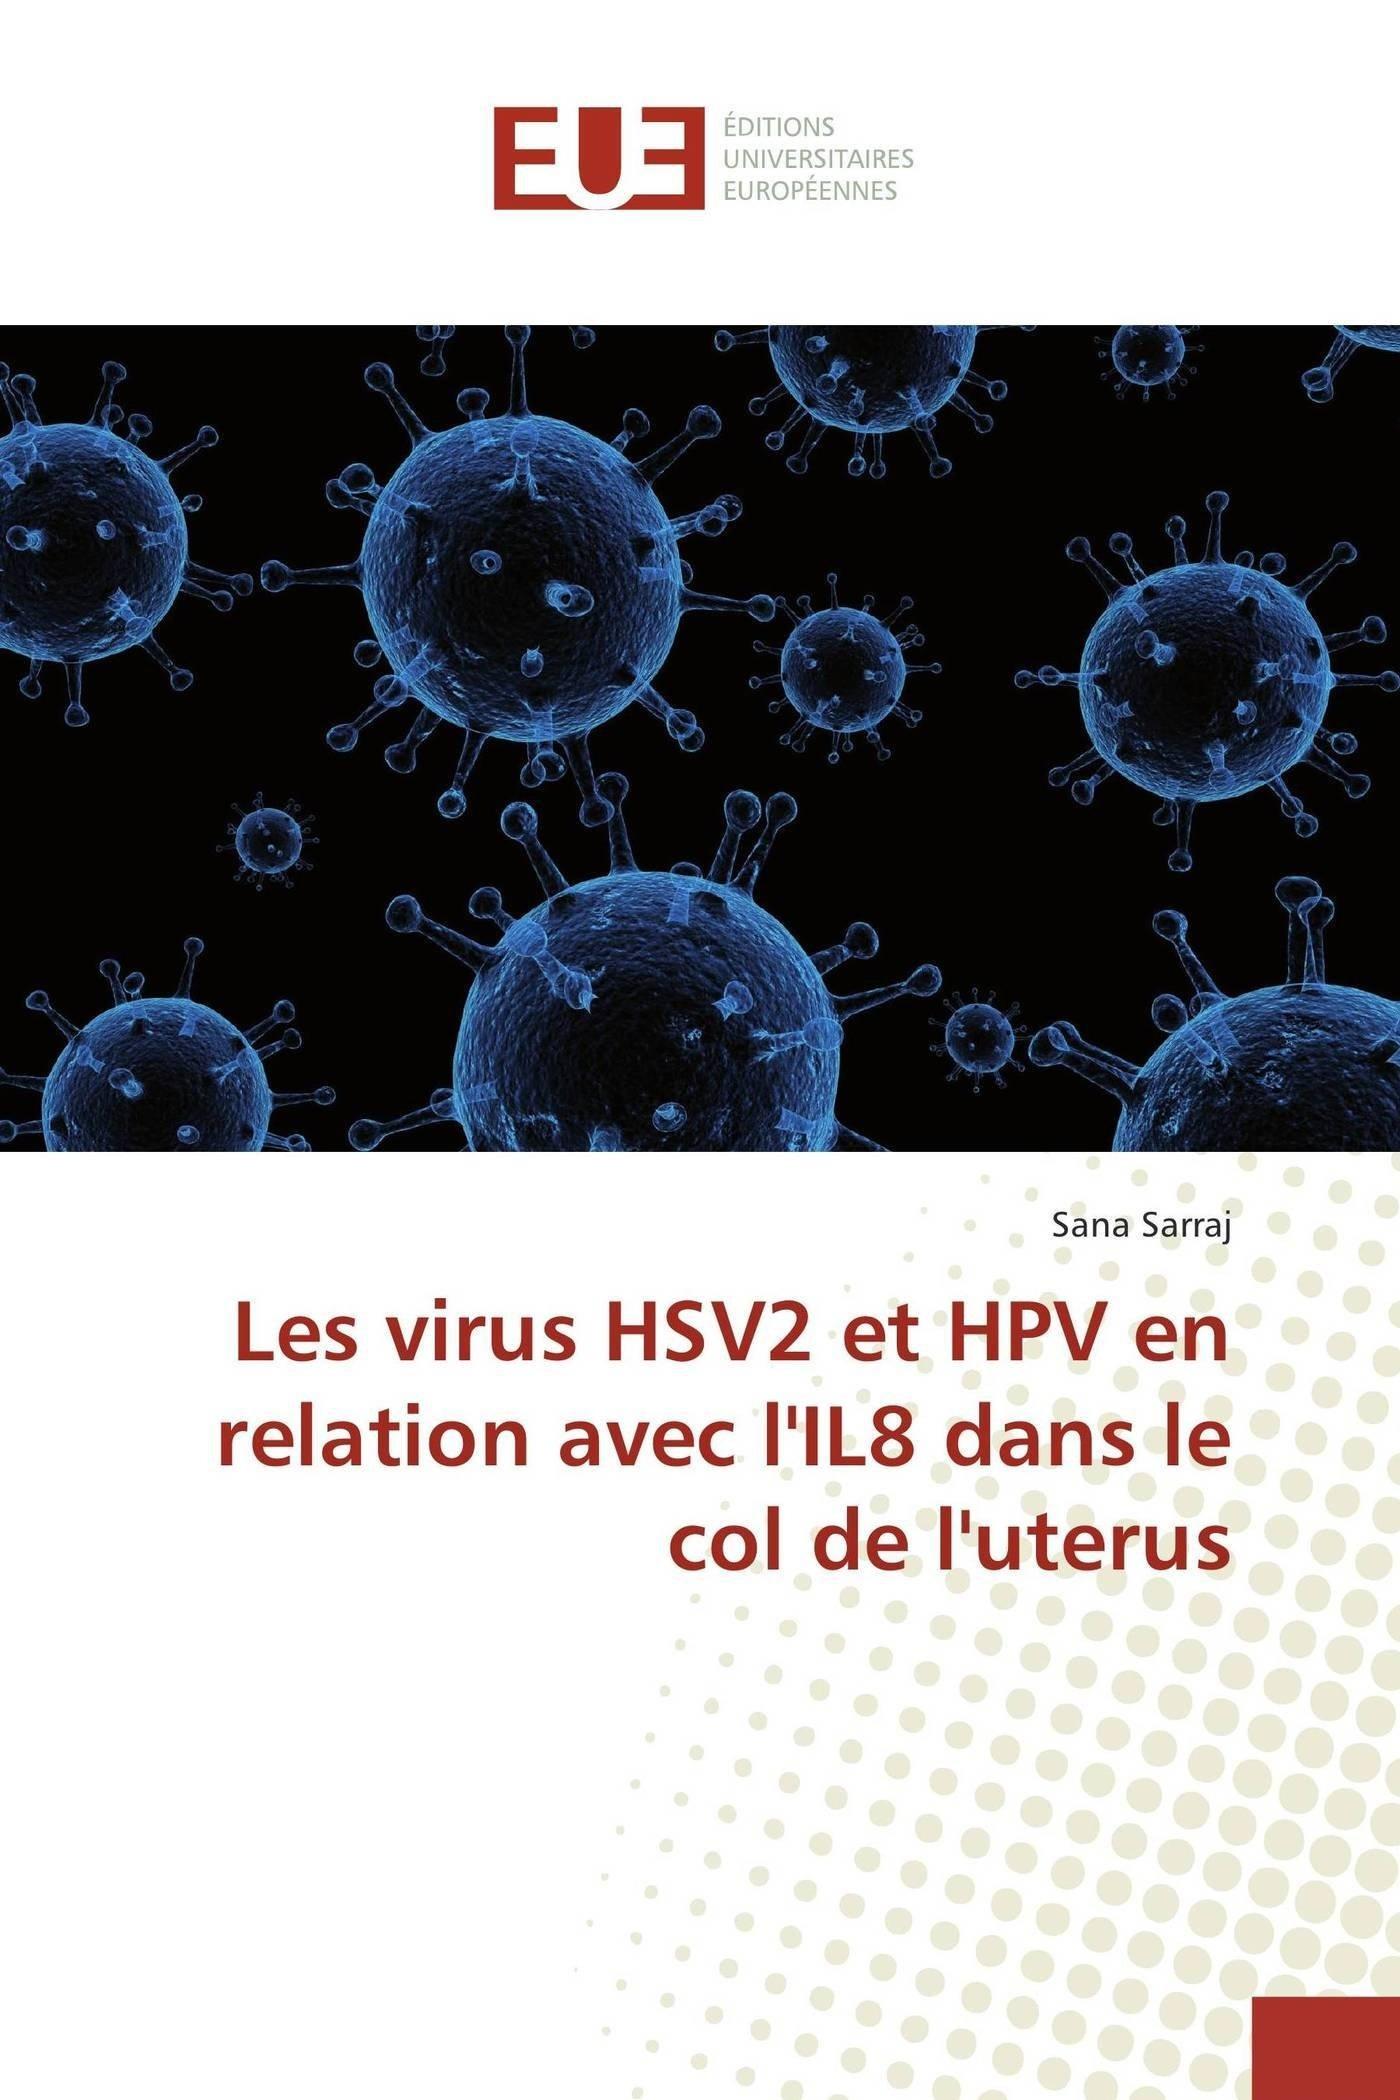 cancer de col uterin herpes hpv high risk nedir